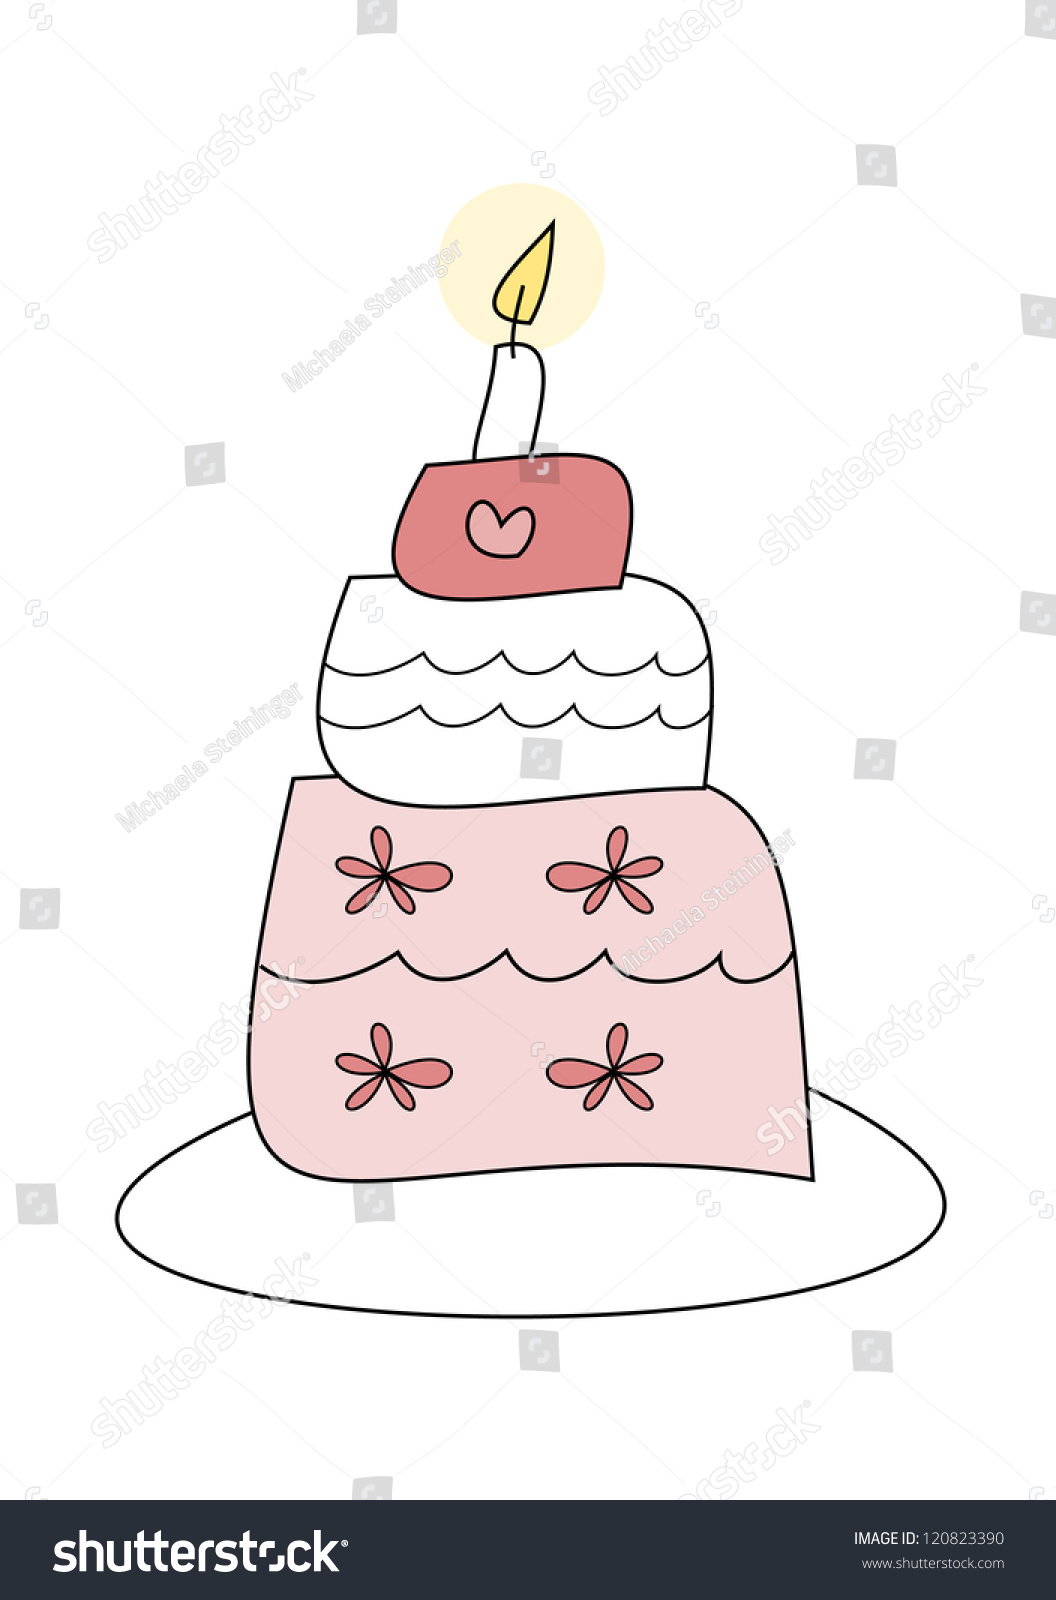 Simple Colorful Drawing Cake Wedding Birthday Stock